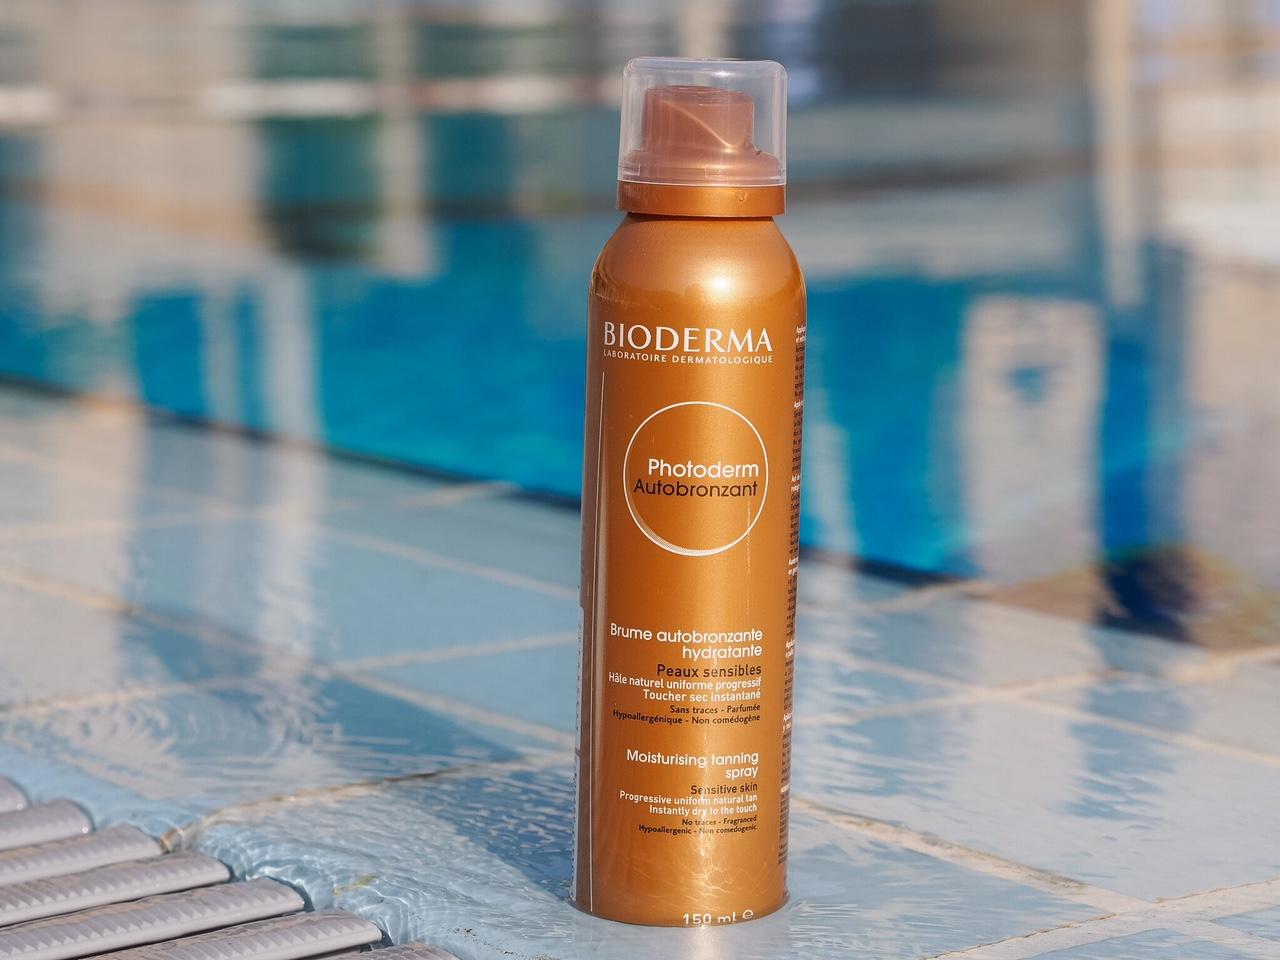 , Bioderma Photoderm Autobronzant Moisturising Tanning Spray